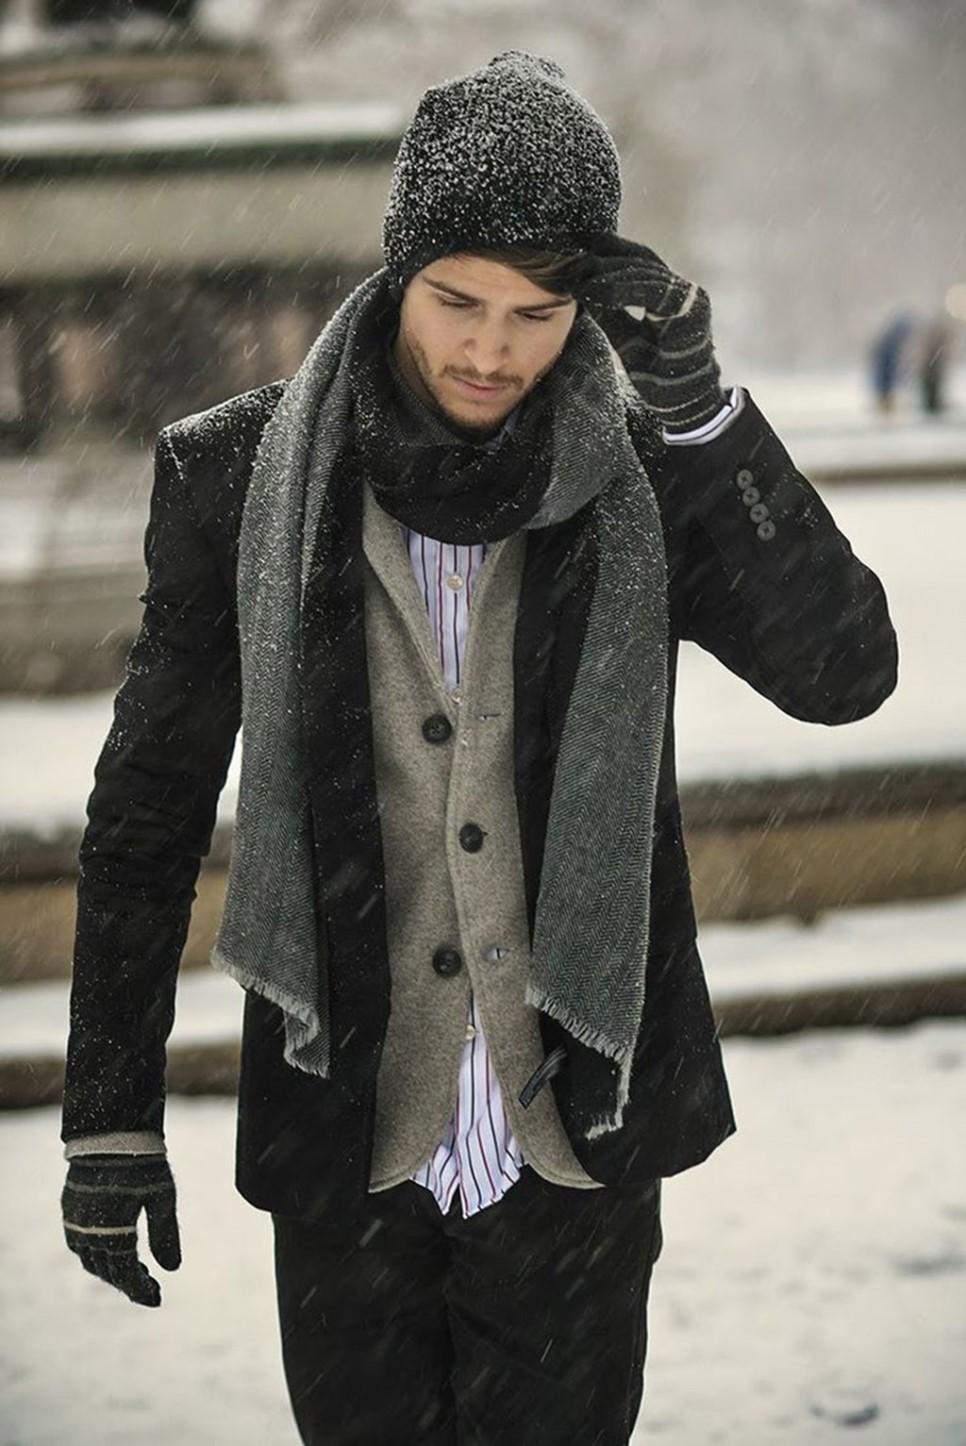 pea-coat-blazer-long-sleeve-shirt-jeans-beanie-scarf-gloves-original-4141.jpg